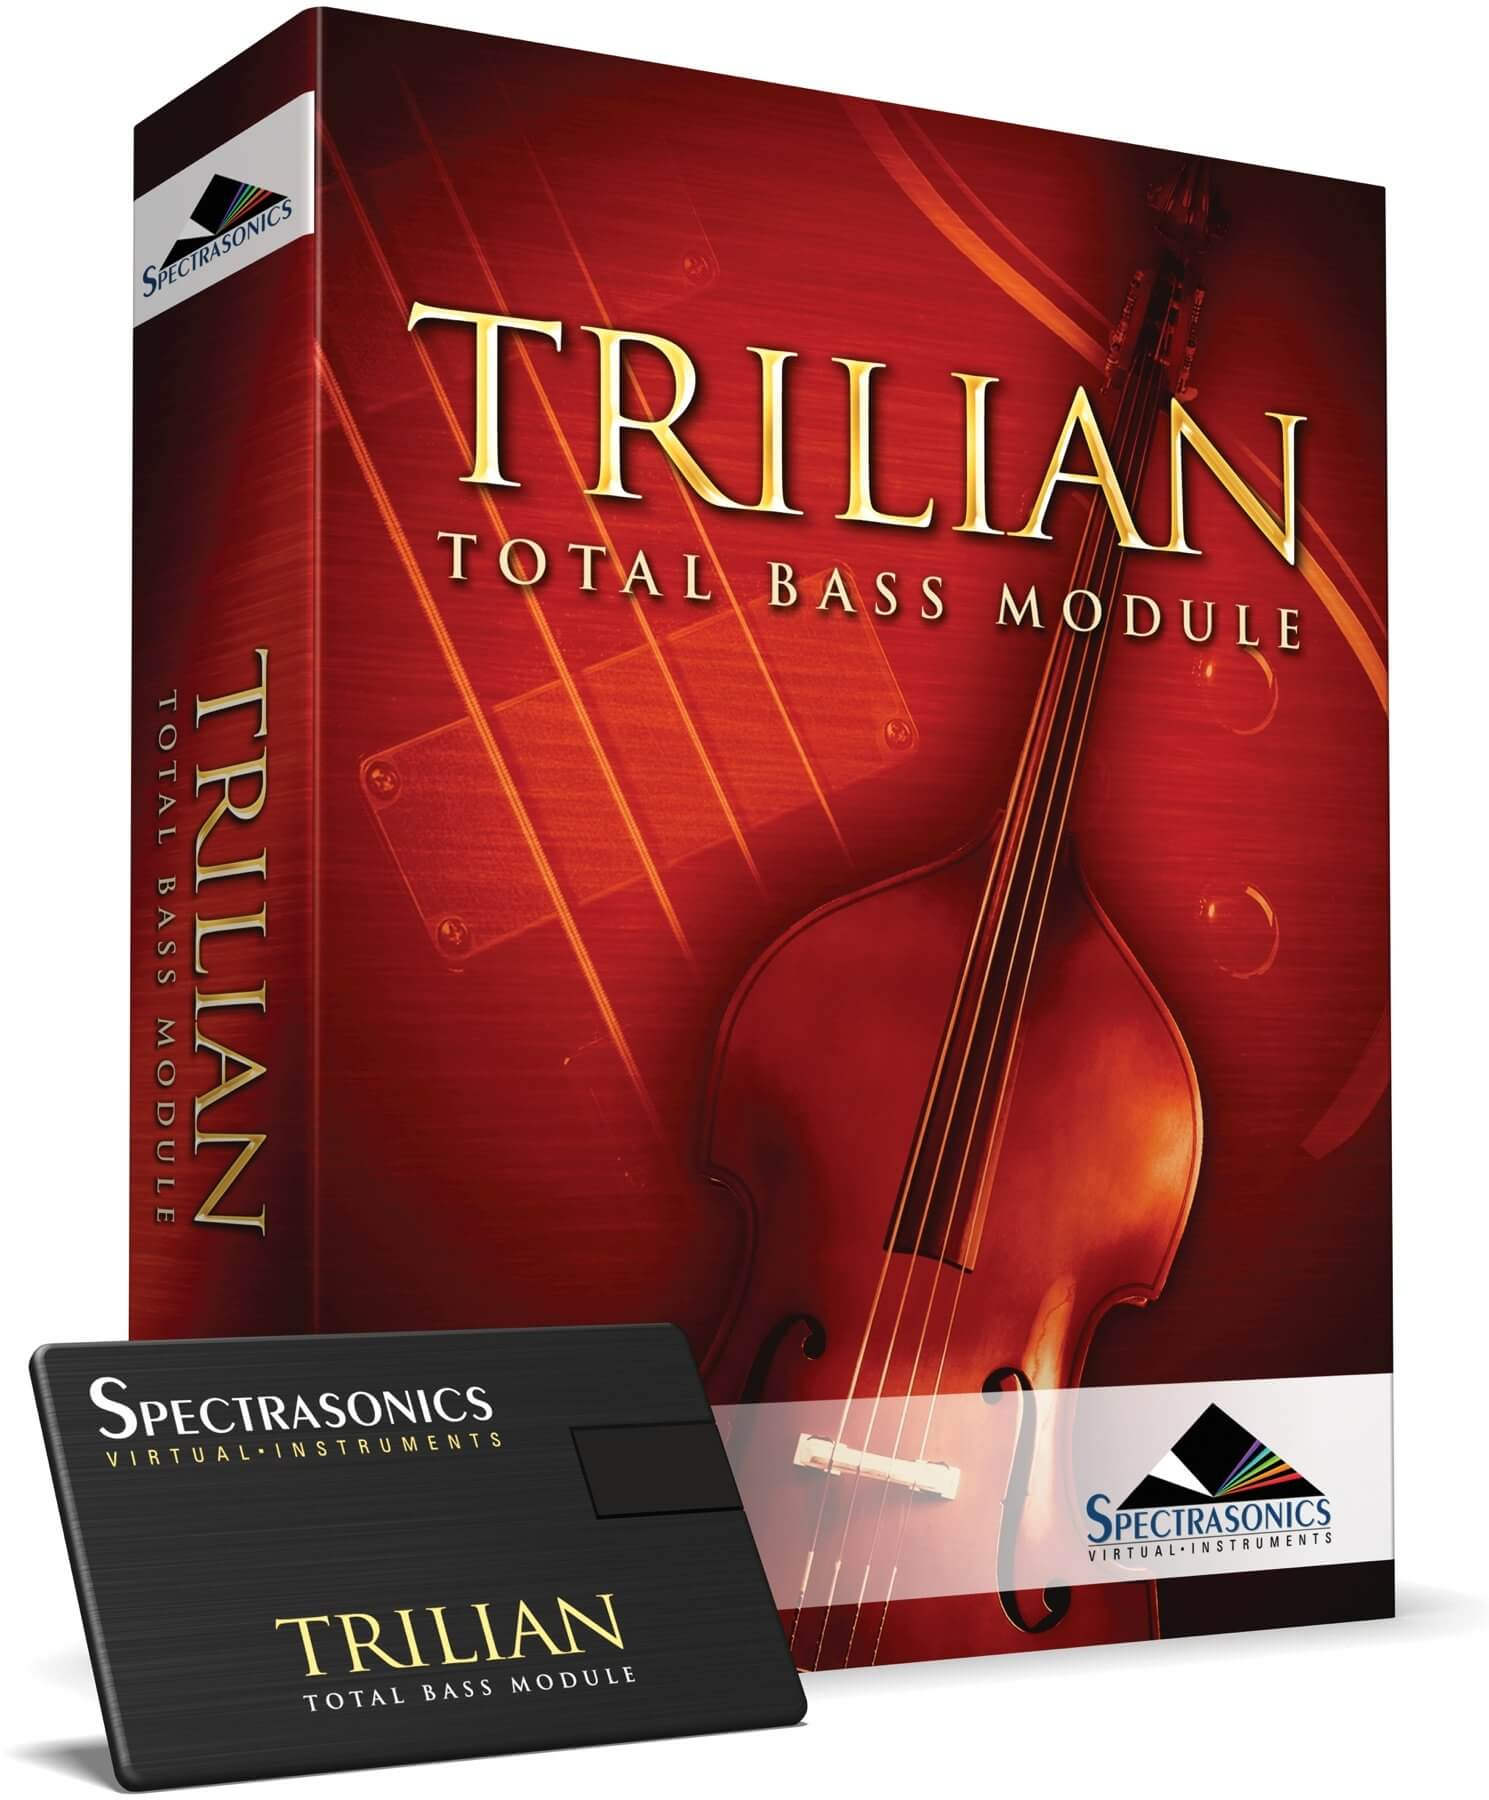 Trilian 1.5 free vst crack 2021